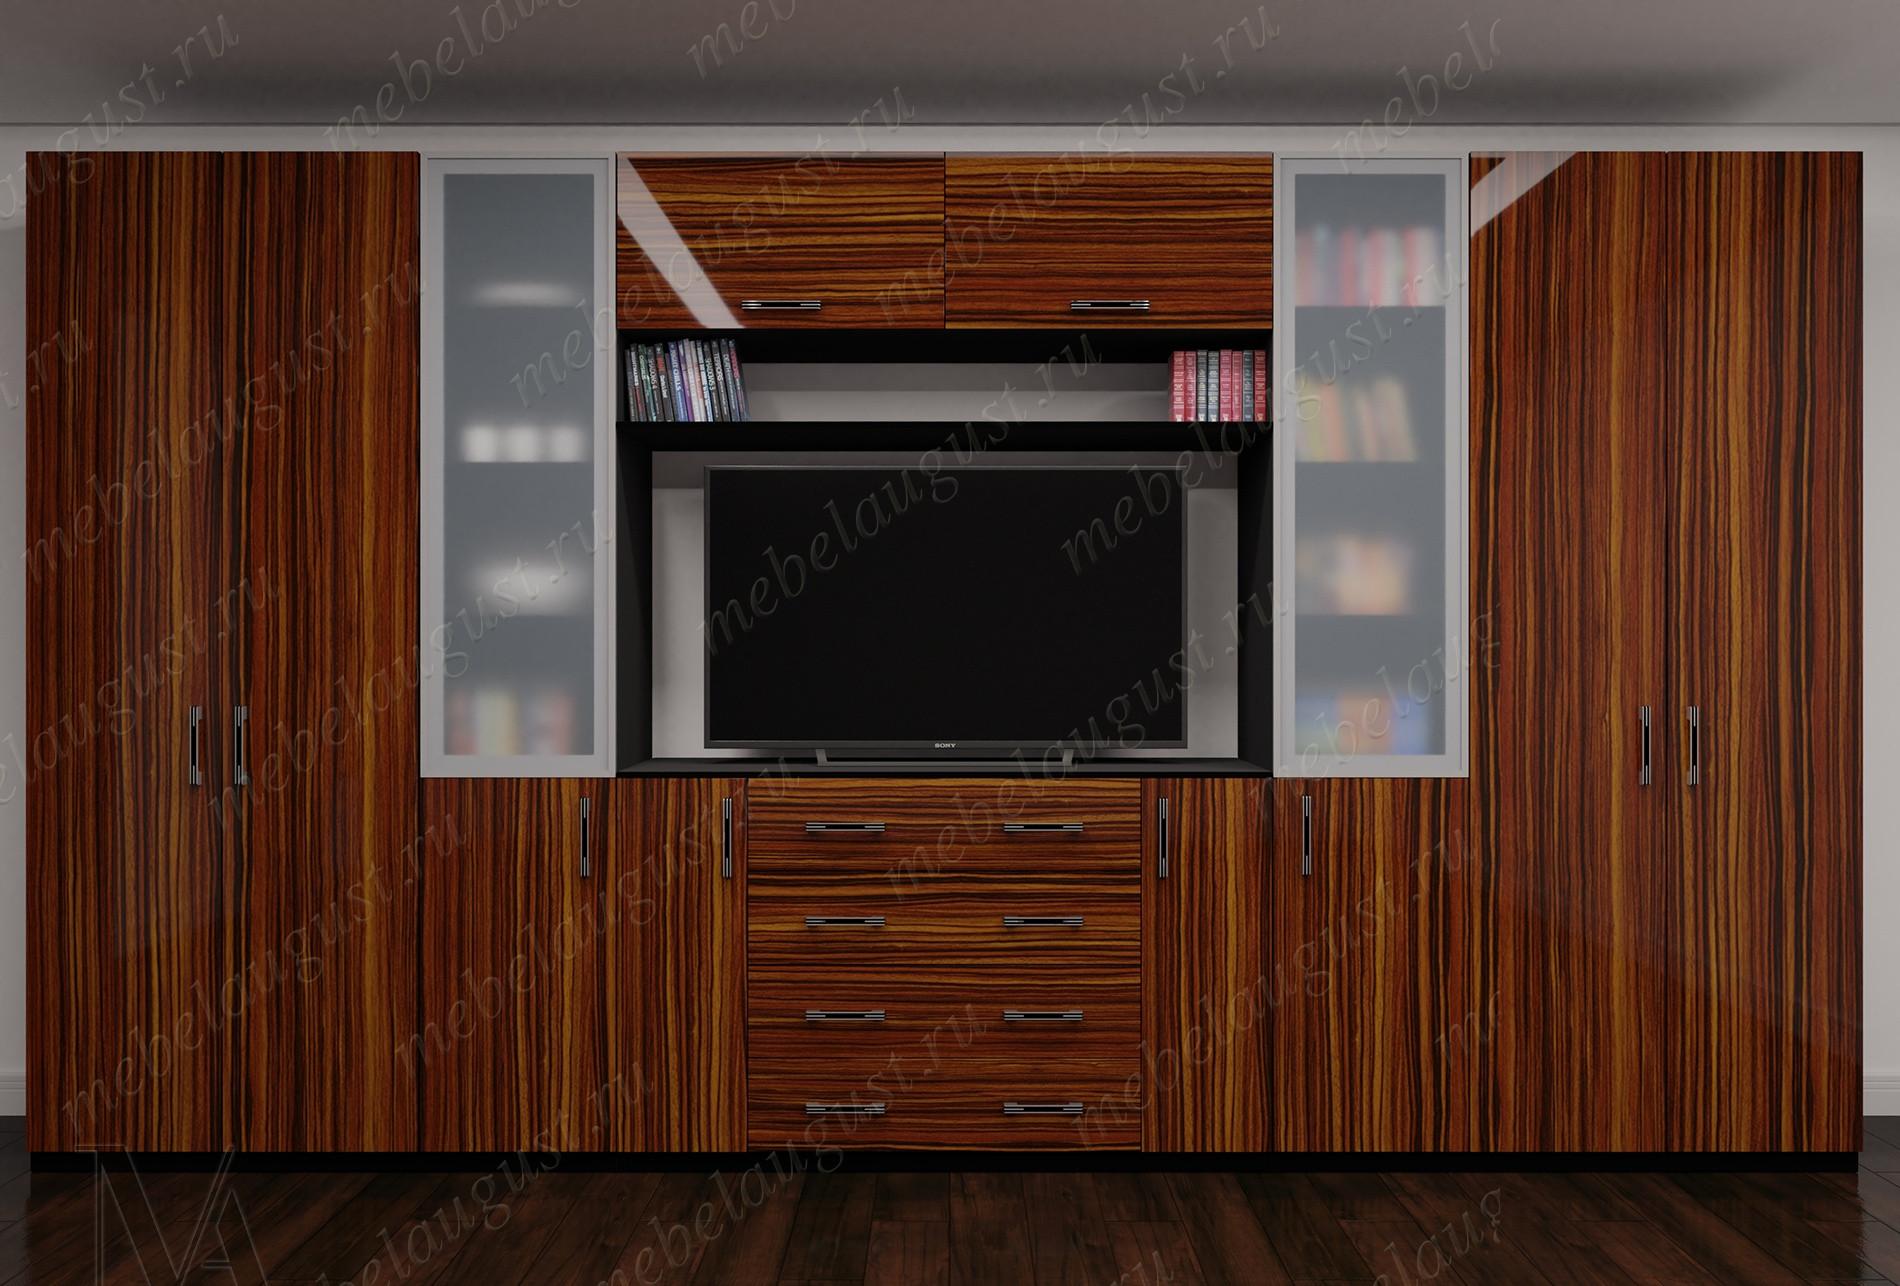 Стенка для спальни с полкой для телевизора цвета макасар